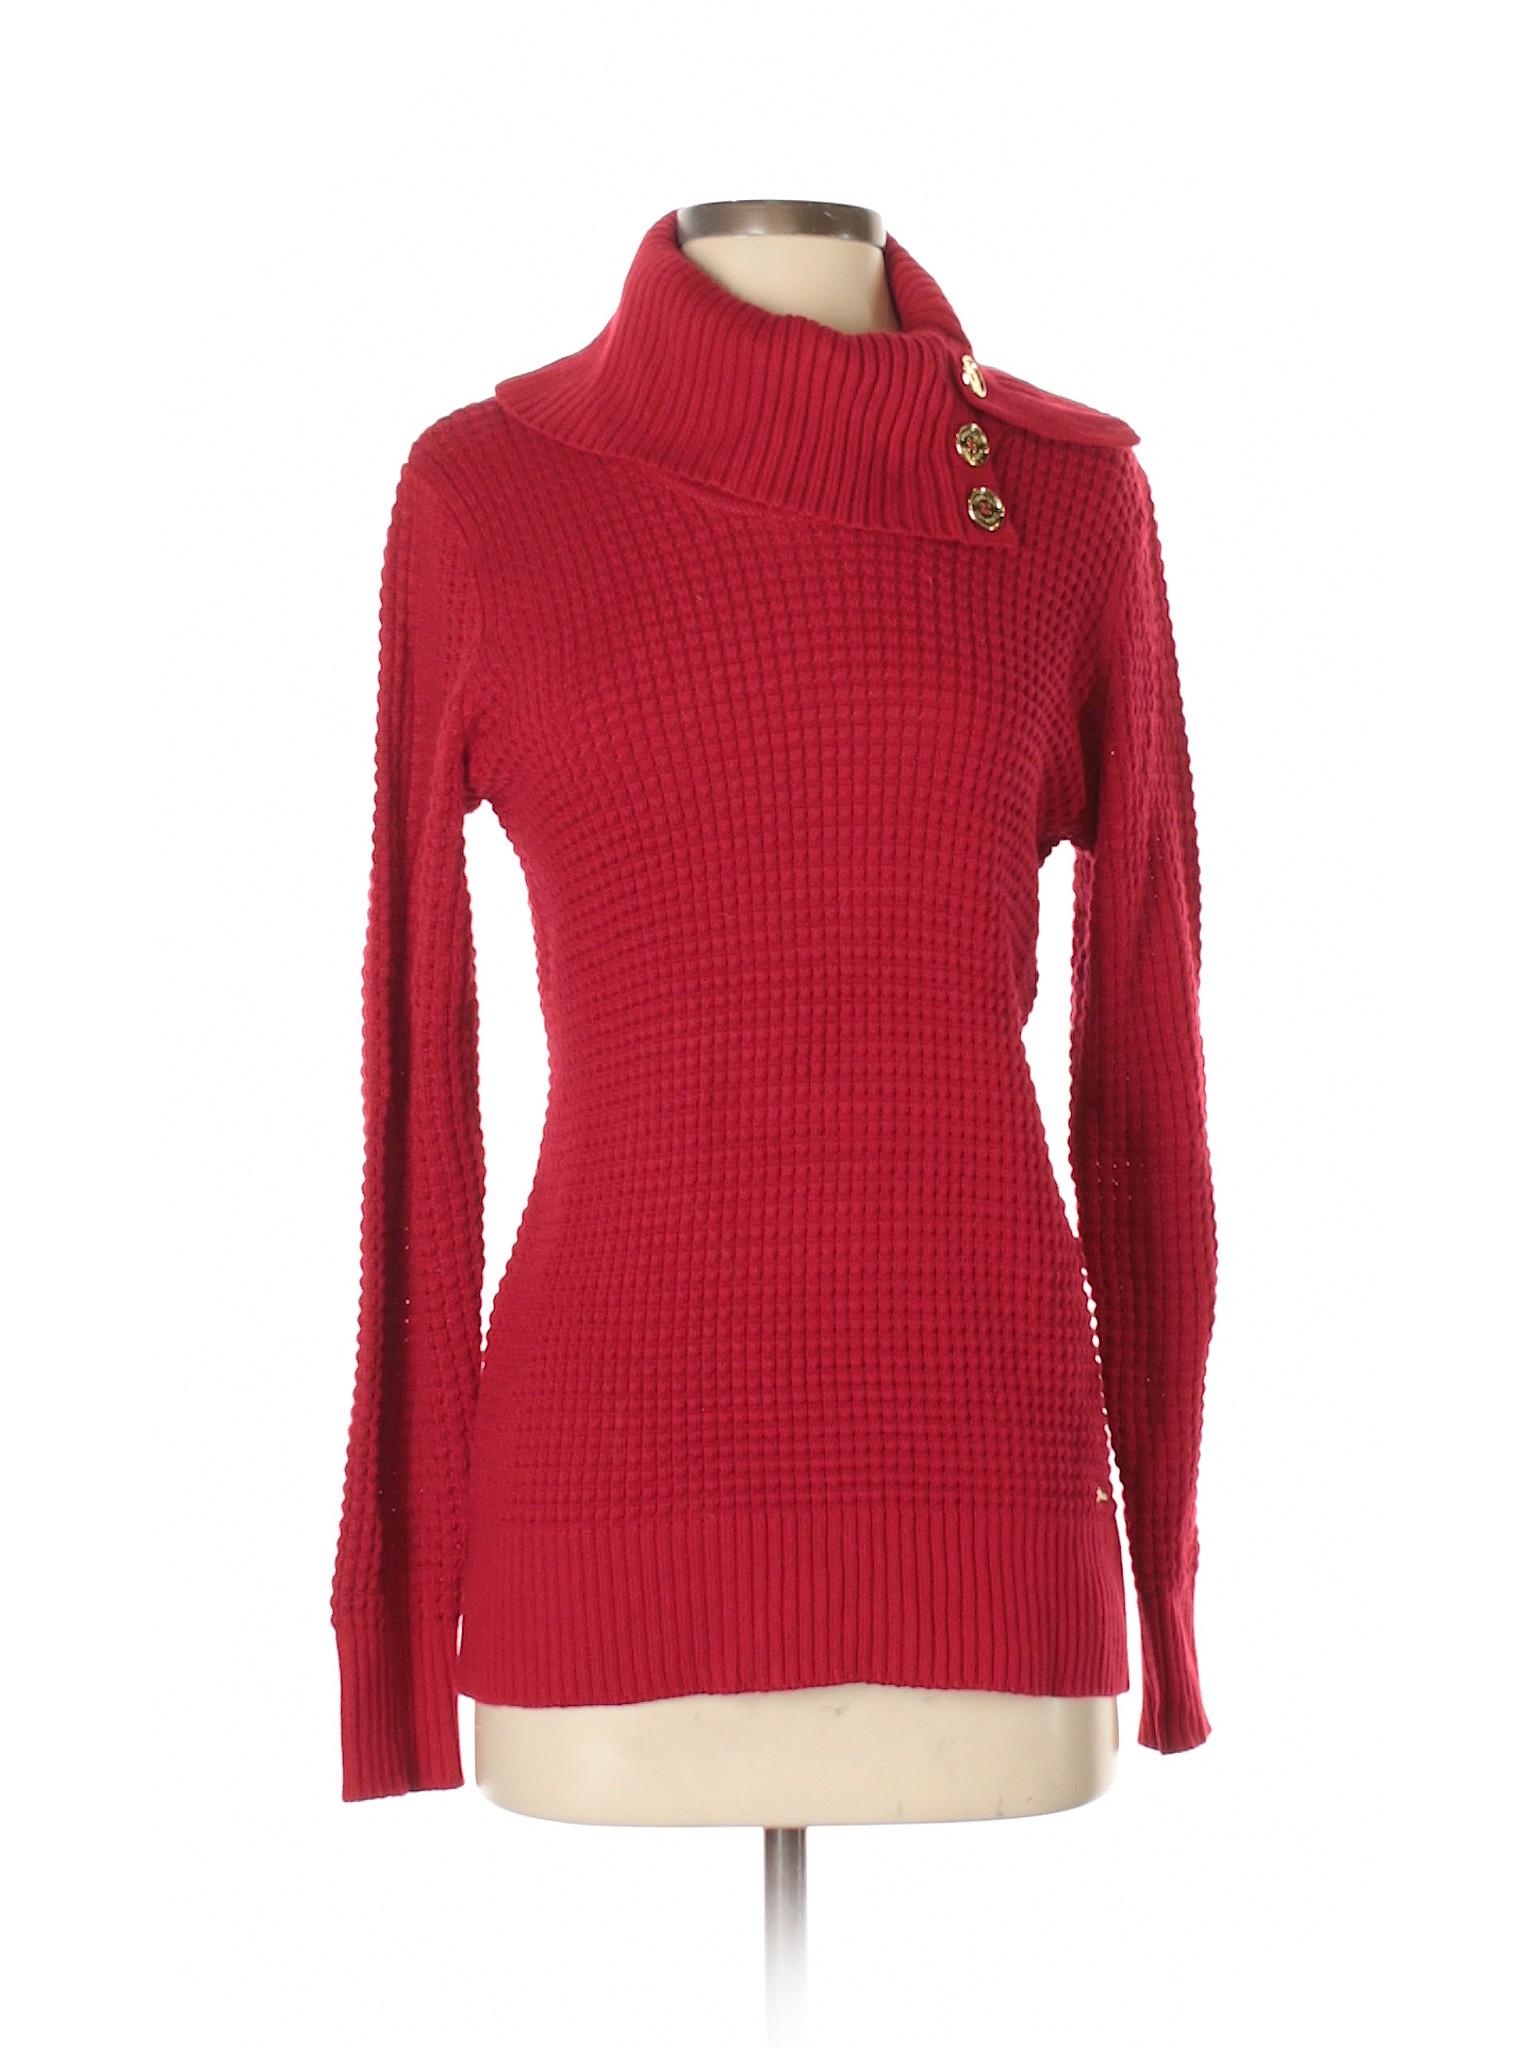 Sweater winter Klein Boutique Pullover Calvin 4IcBWS8q6